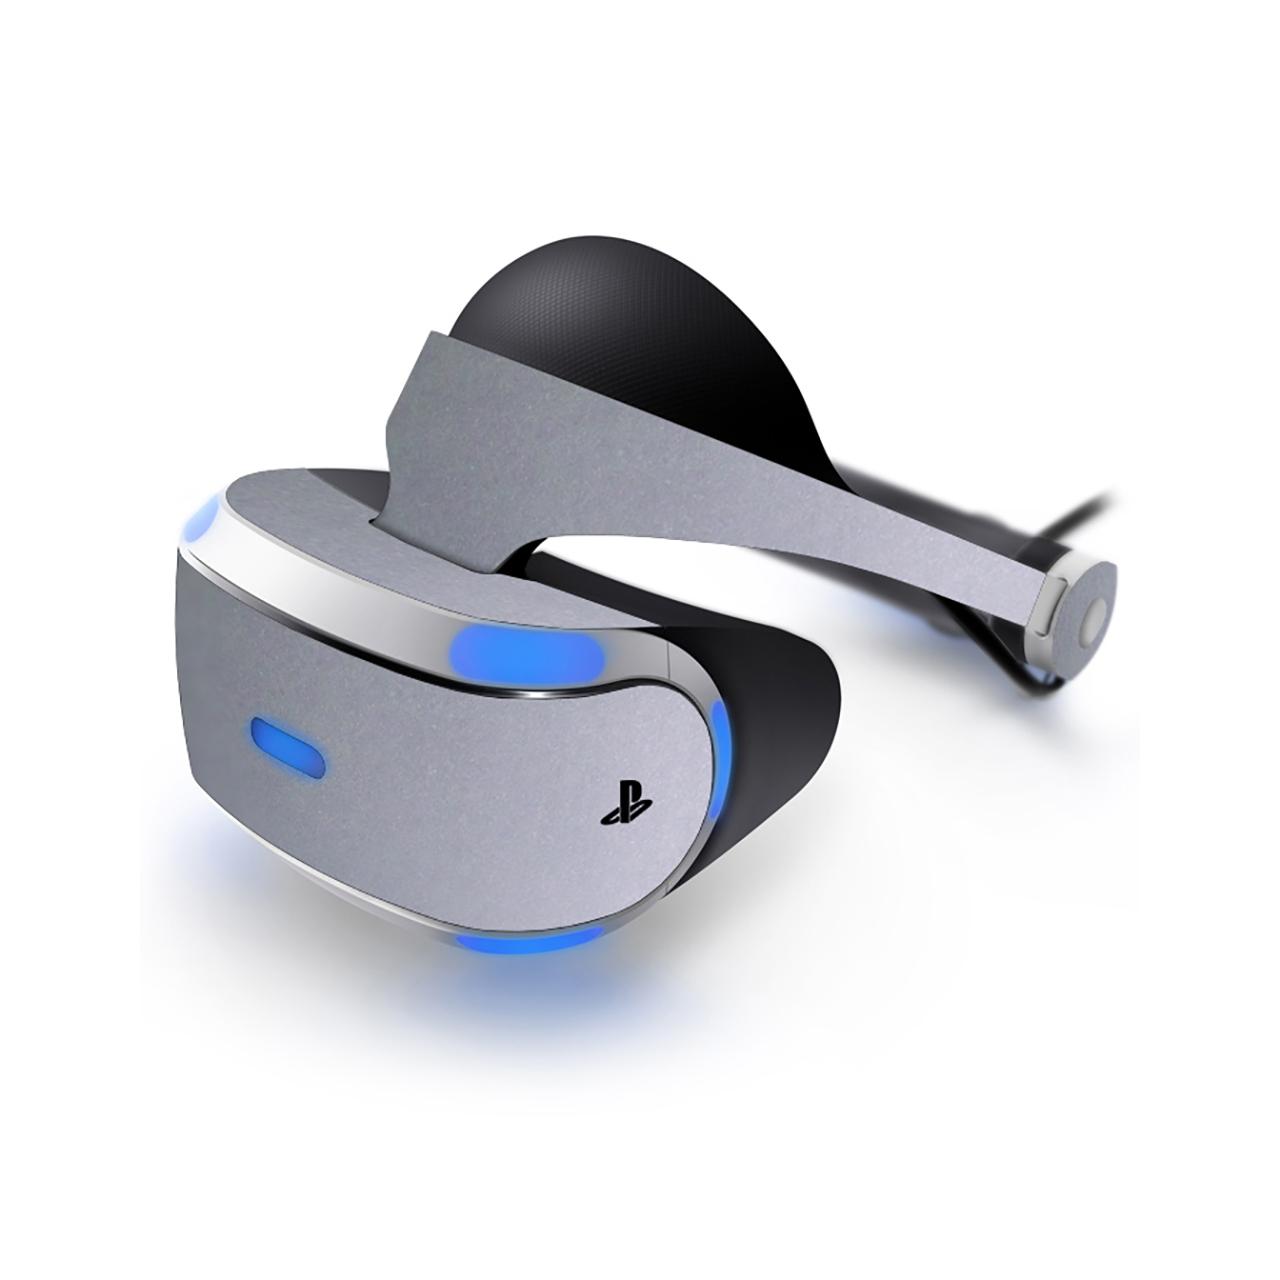 برچسب رنگ Silver-matte ماهوت مناسب برای عینک واقعیت مجازی  PlayStation VR